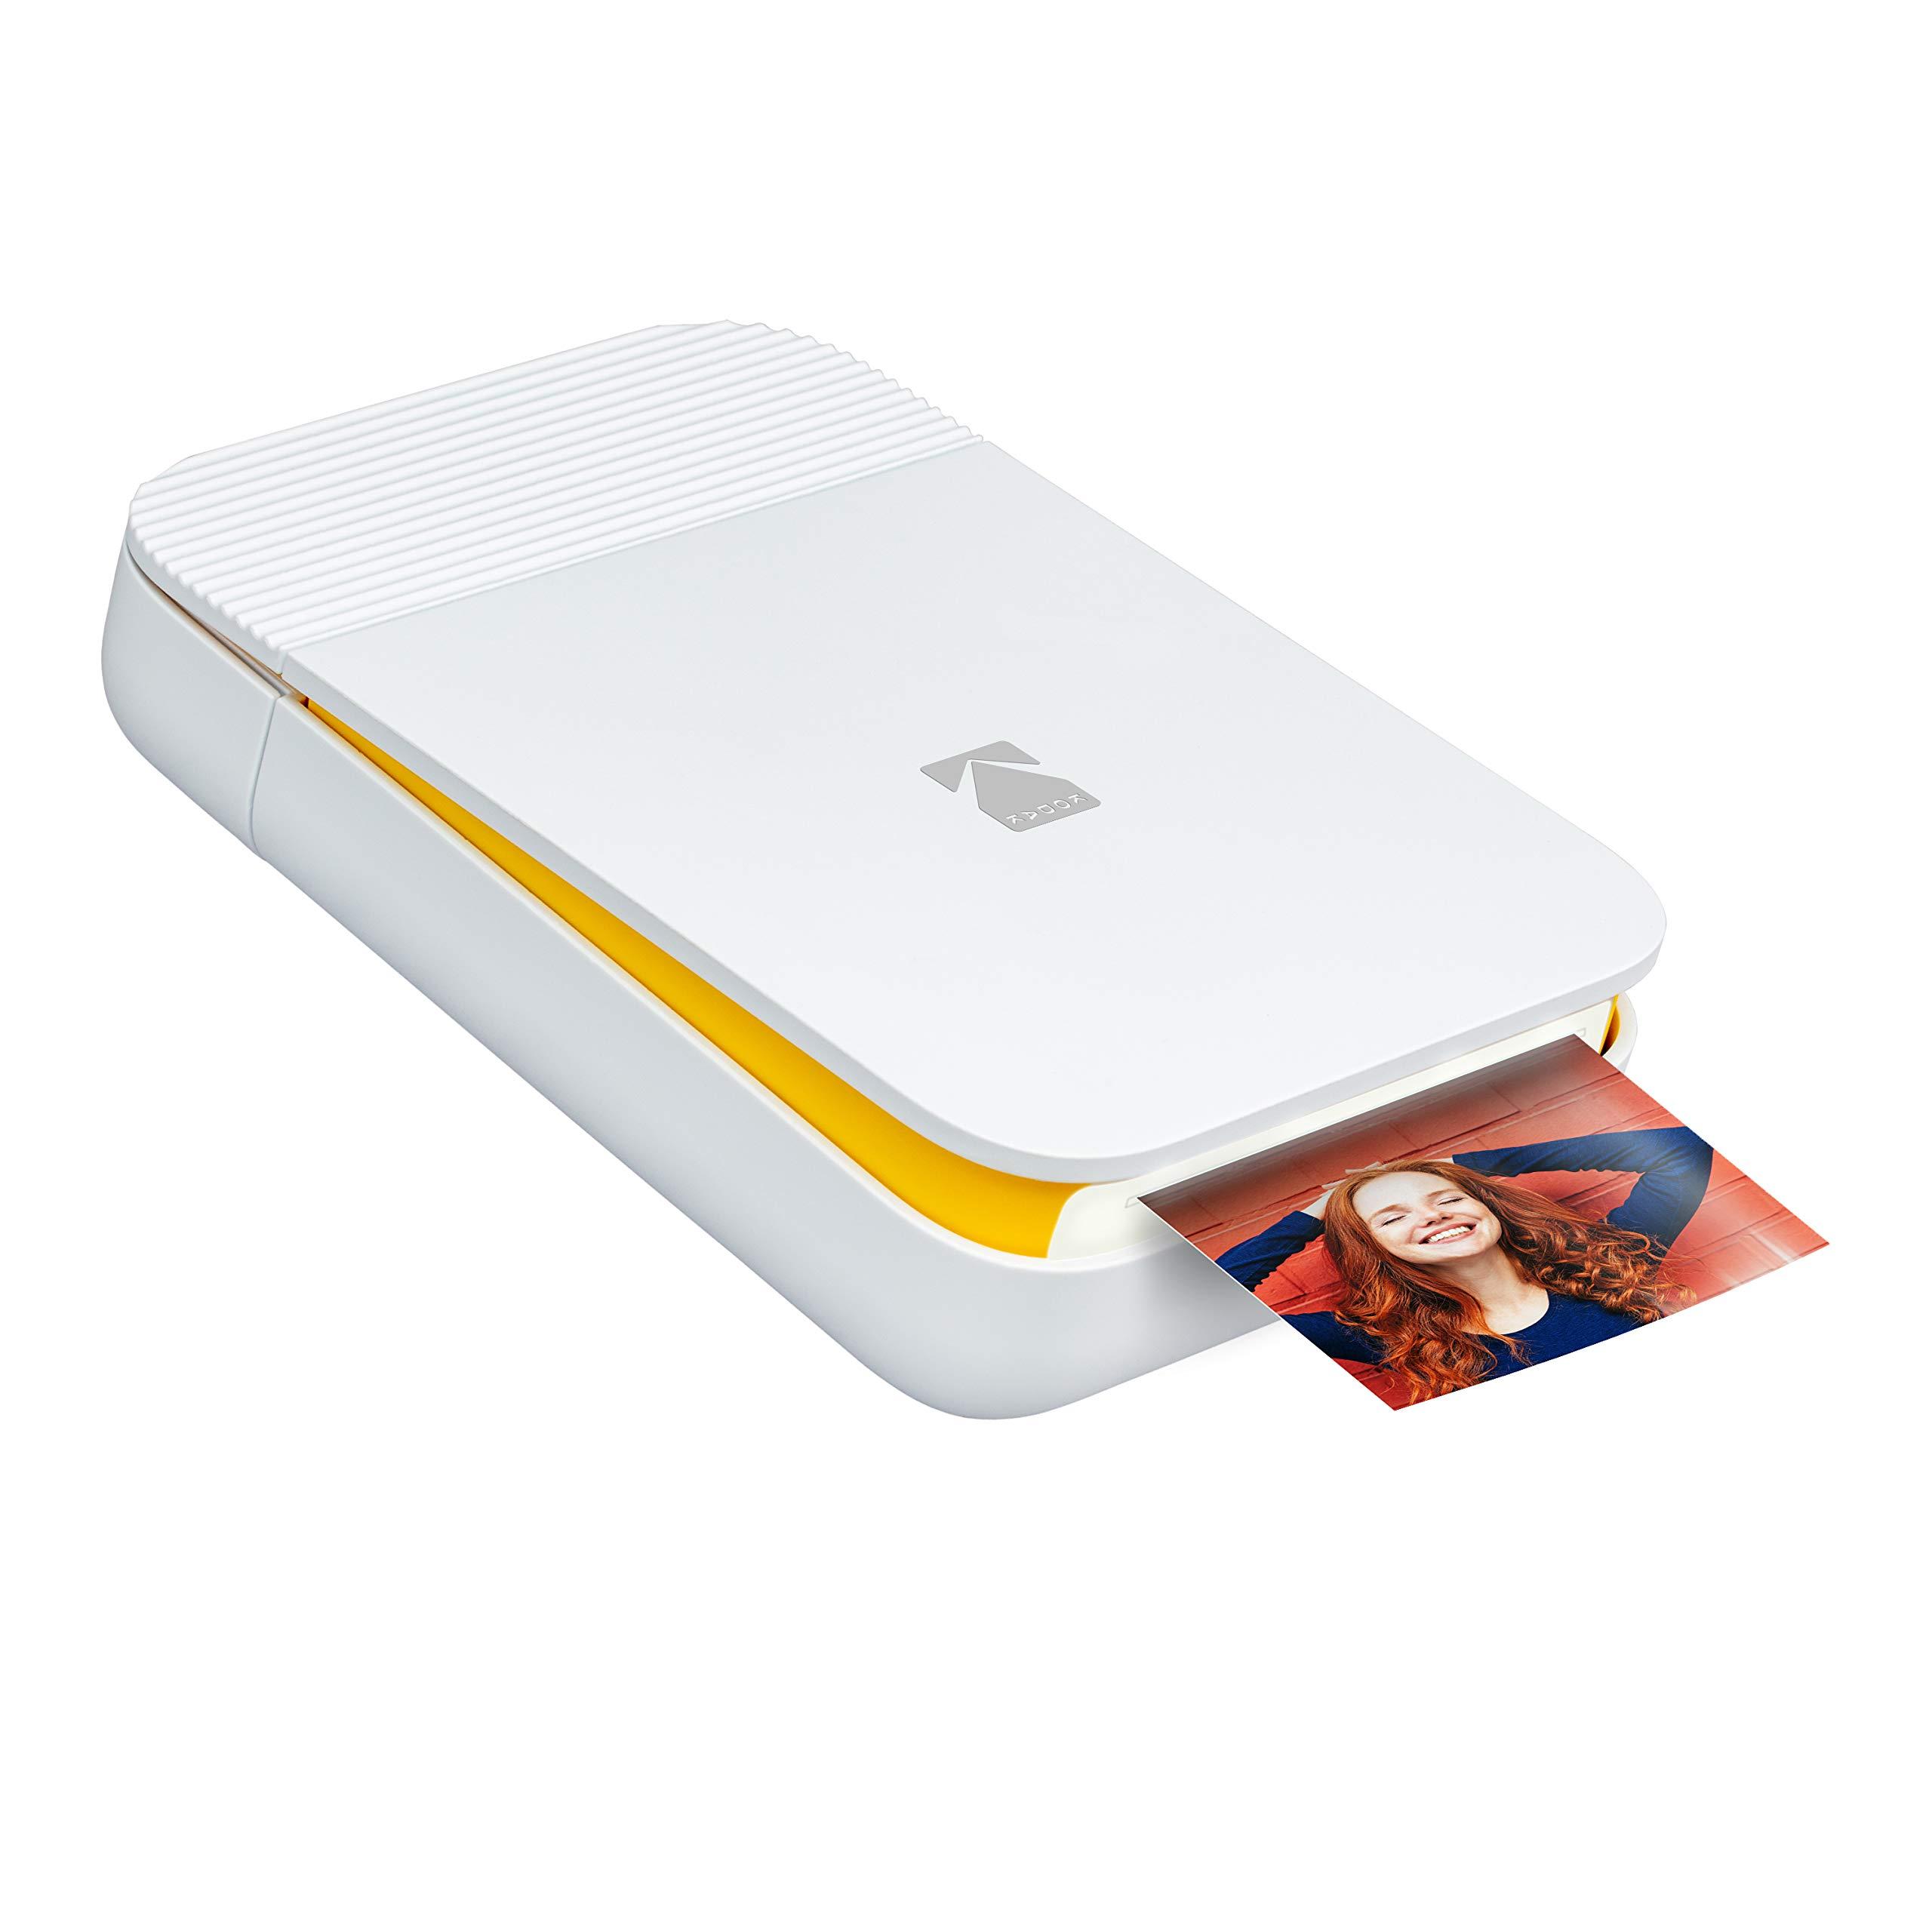 KODAK Smile Instant Digital Printer - Pop-Open Bluetooth Mini Printer for iPhone & Android - Edit, Print & Share 2x3 Zink Photos w/Free Smile App - White/Yellow